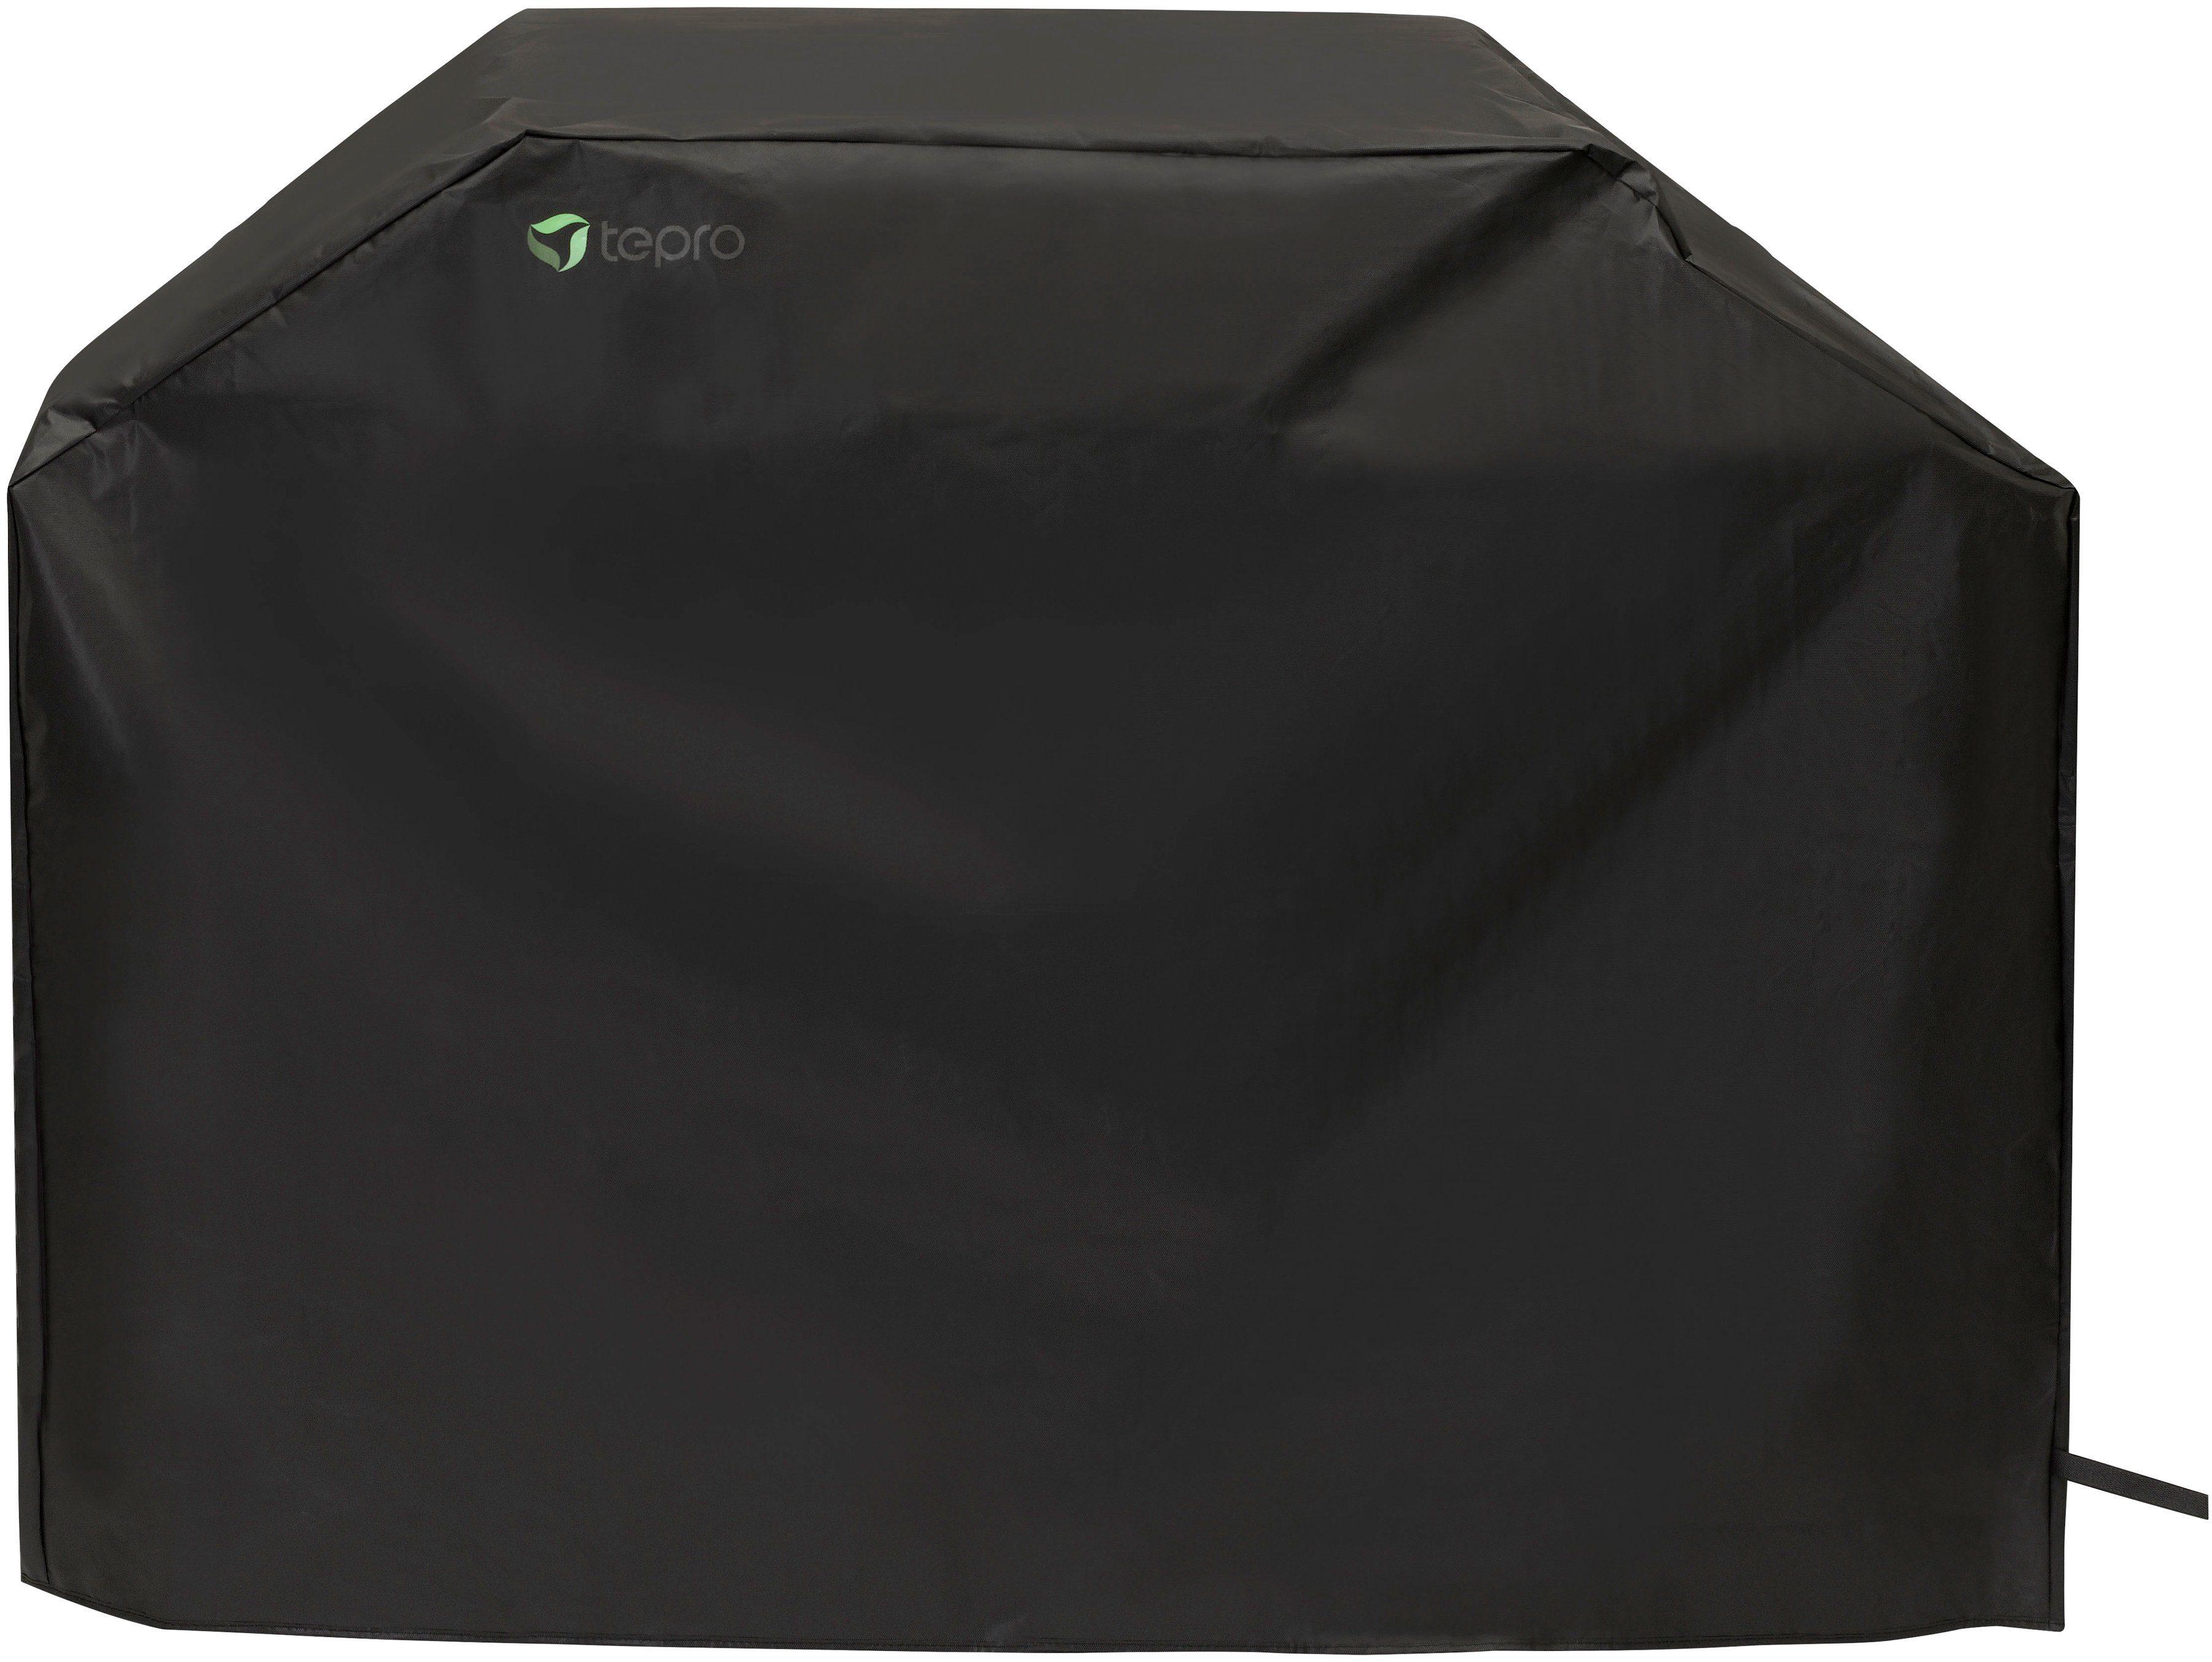 TEPRO Abdeckhaube , BxTxH: 150x70x110 cm, für Gasgrill groß